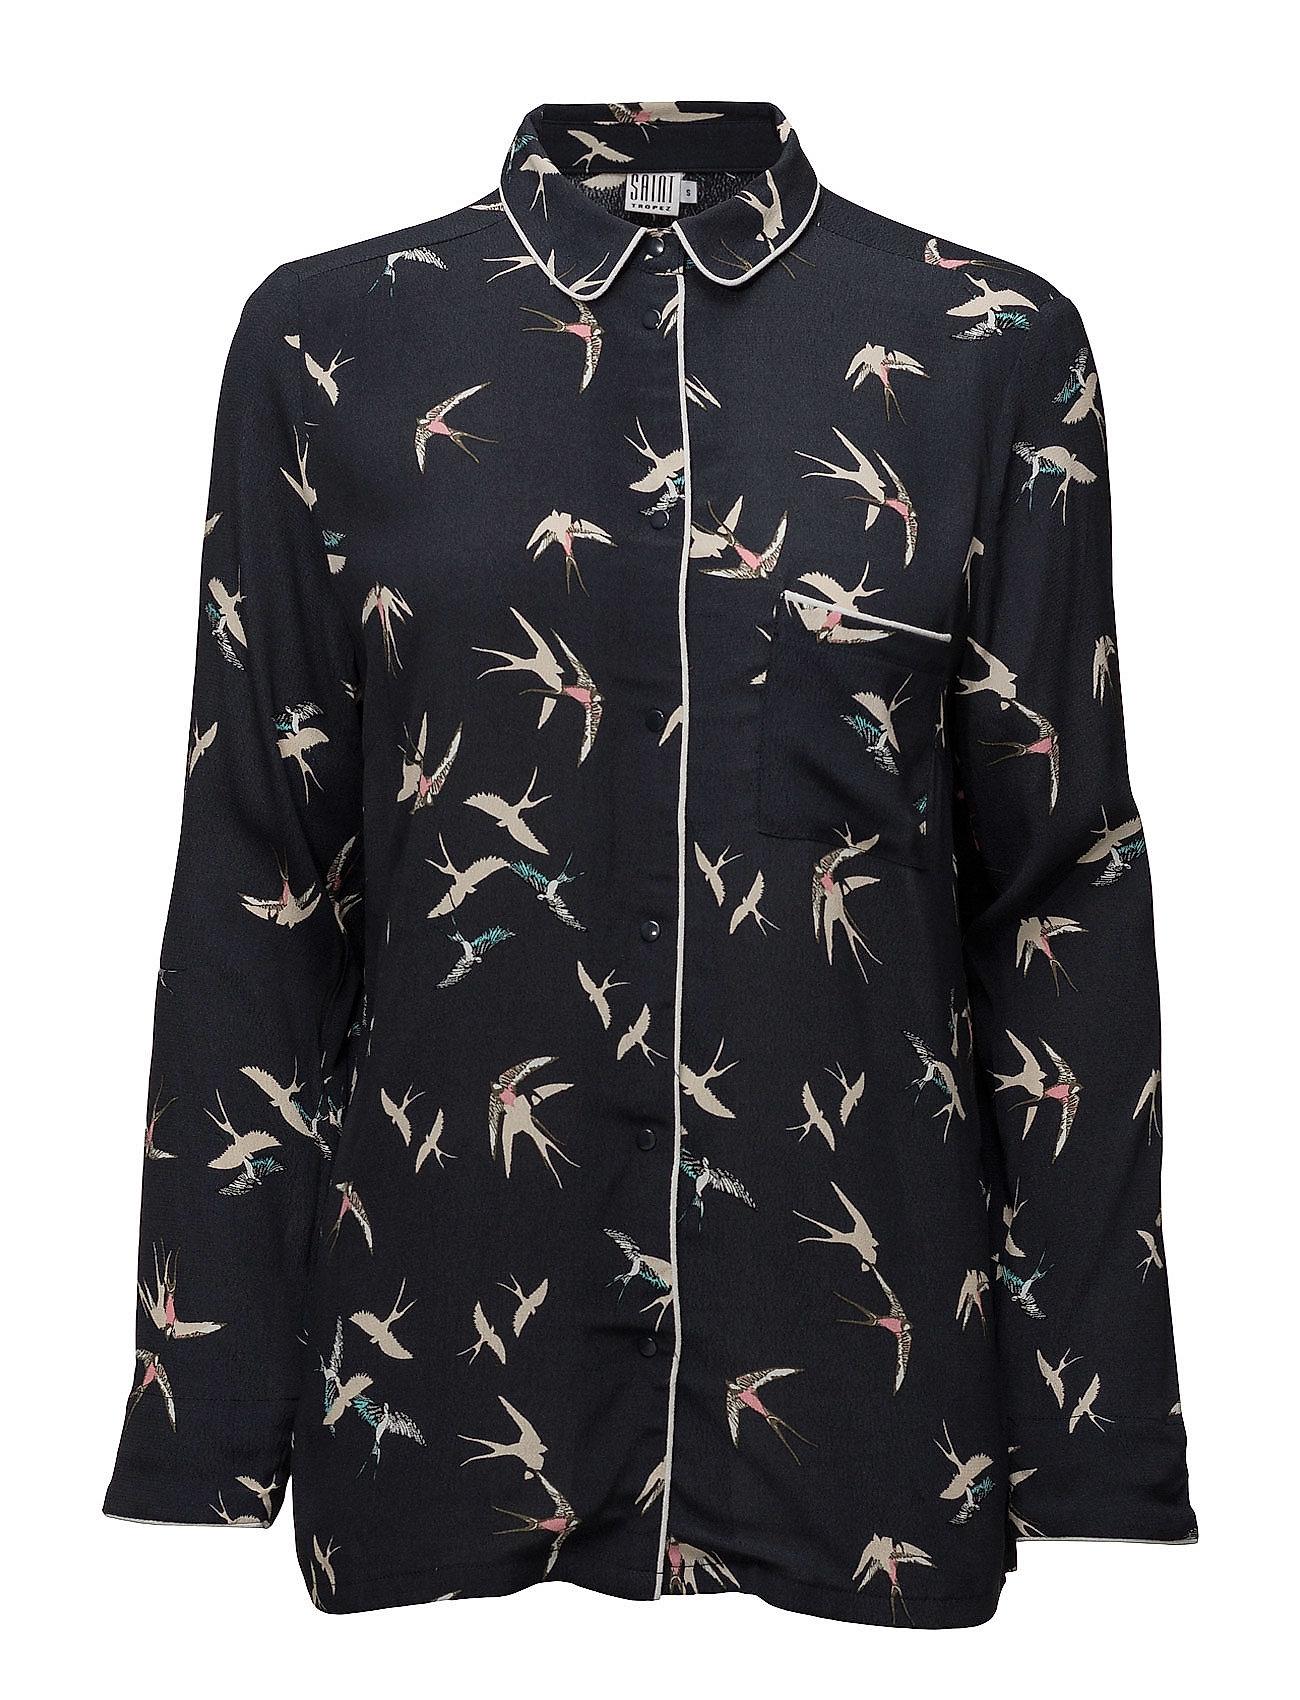 saint tropez – Bird print shirt på boozt.com dk